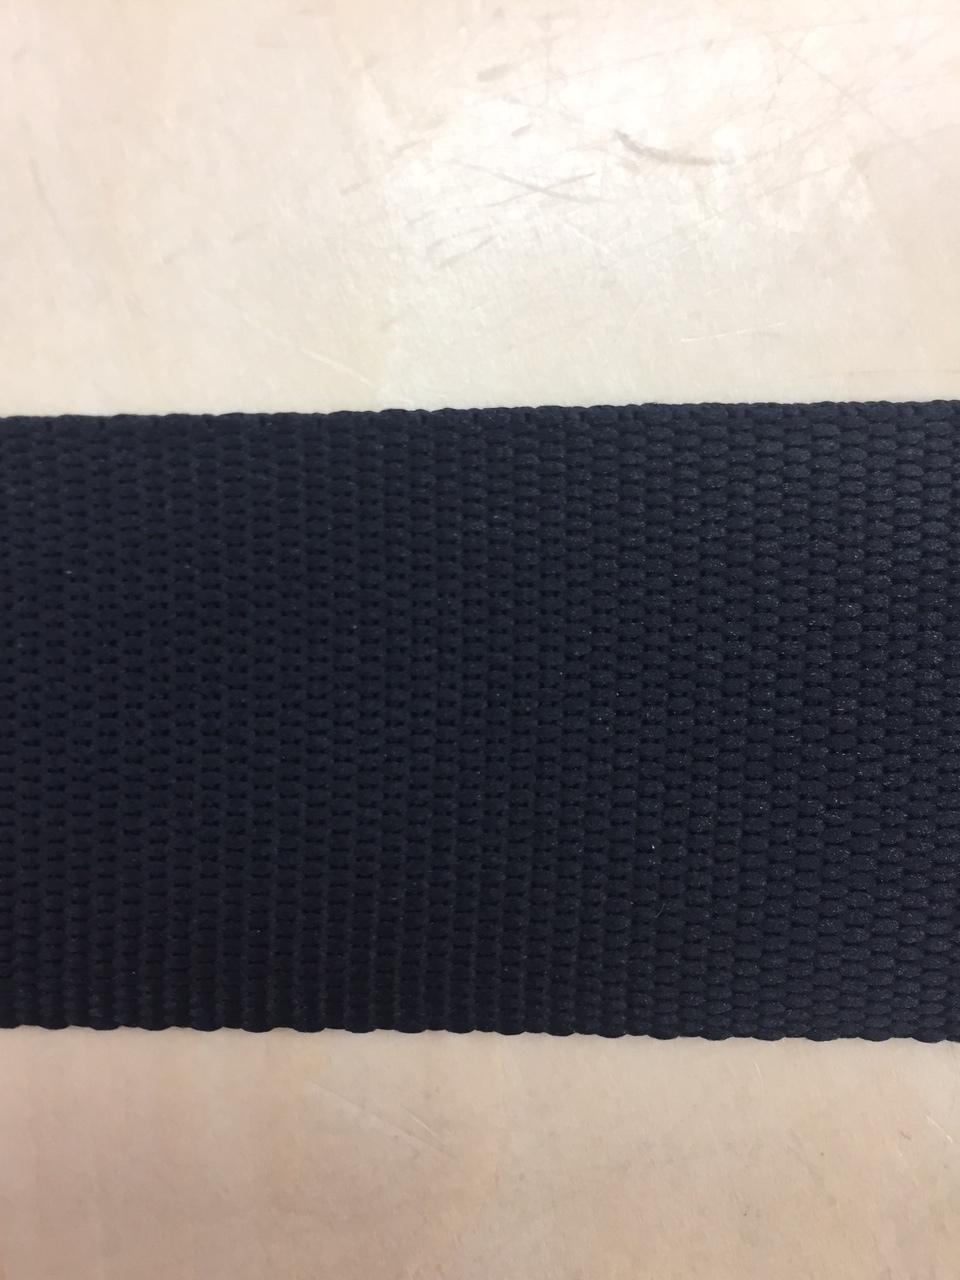 YKK ボリエステルテープ TH15 1.5mm厚 50mm幅 黒 1m単位